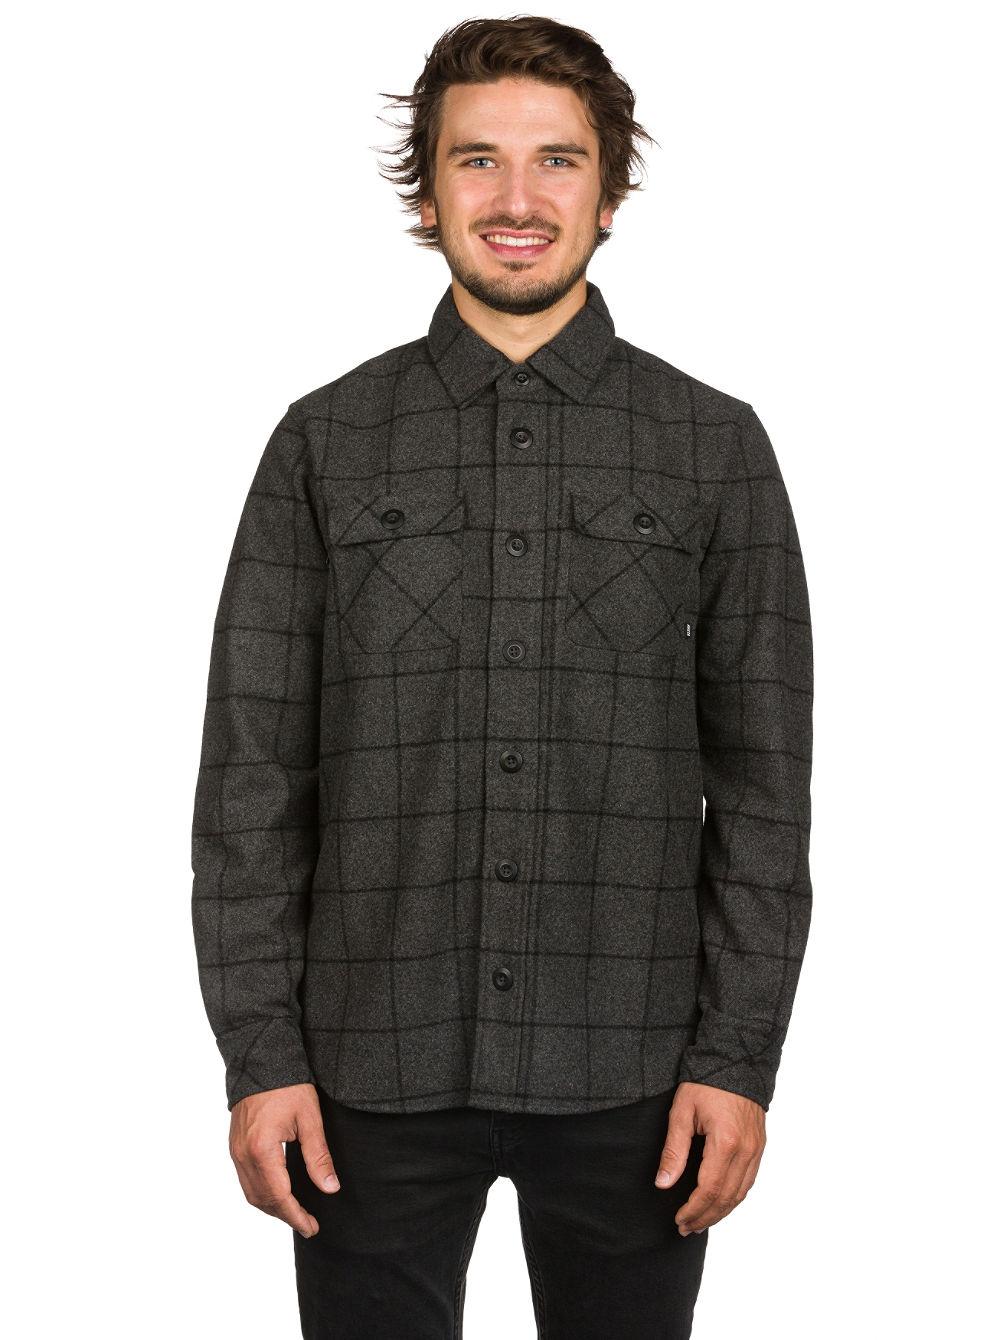 nike-holgate-yarn-dye-wool-ls-shirt-ls